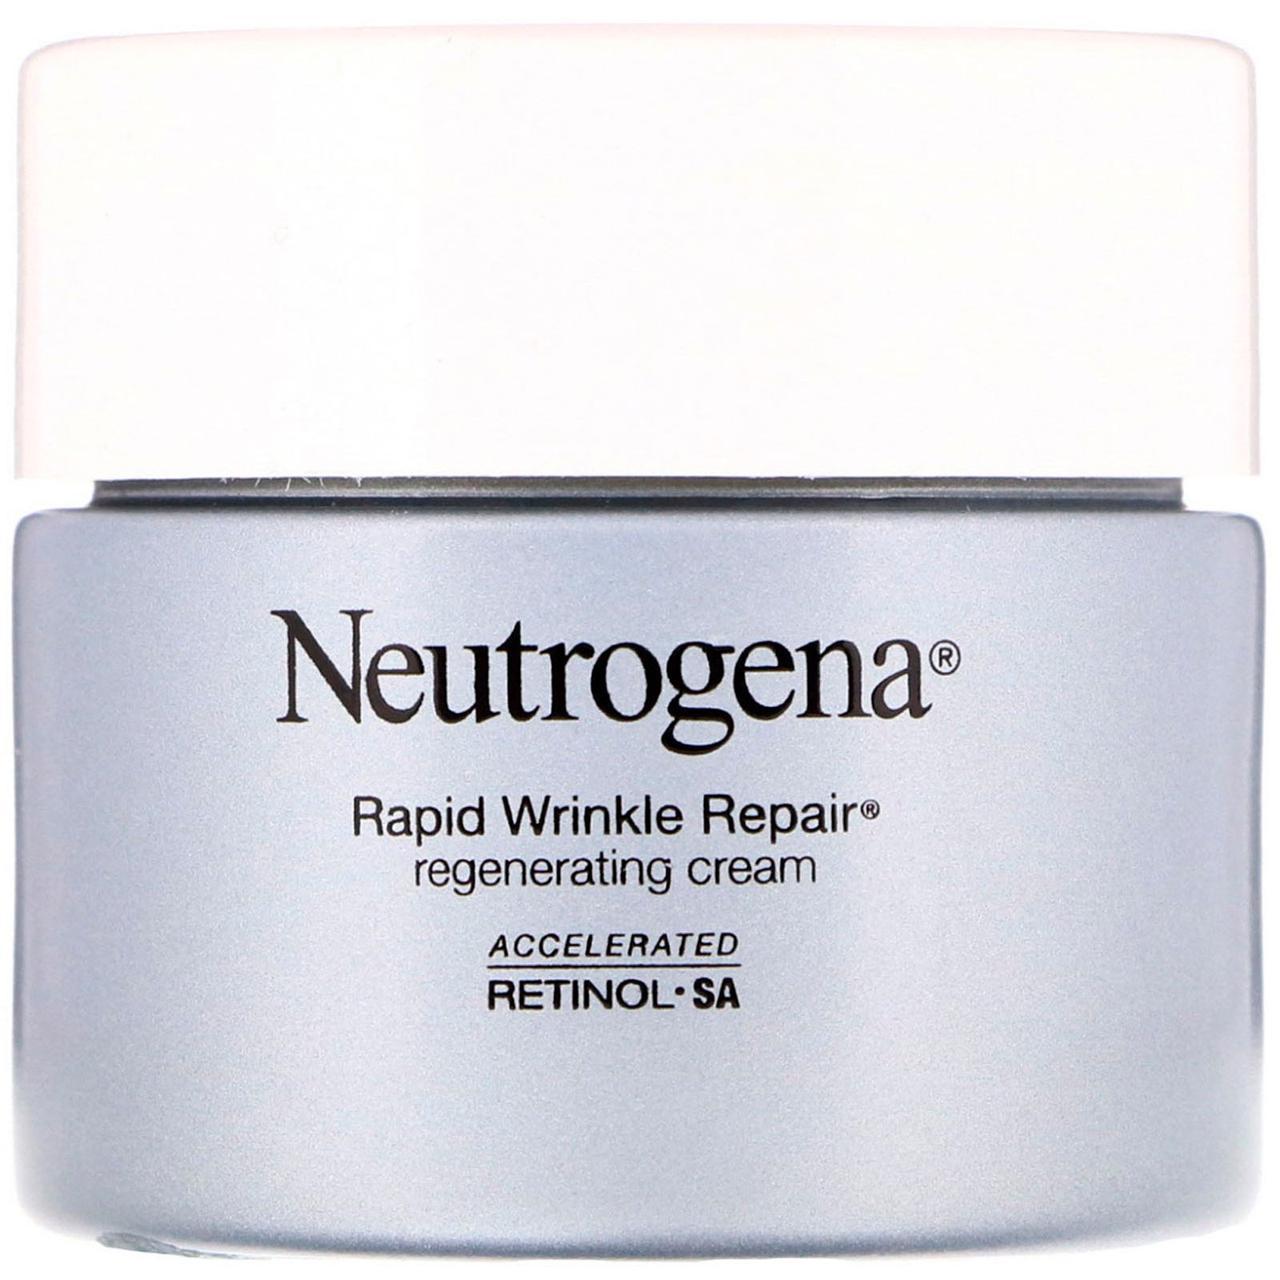 "Восстанавливающий крем против морщин ""Rapid Wrinkle Repair"" от Neutrogena, 48 г"